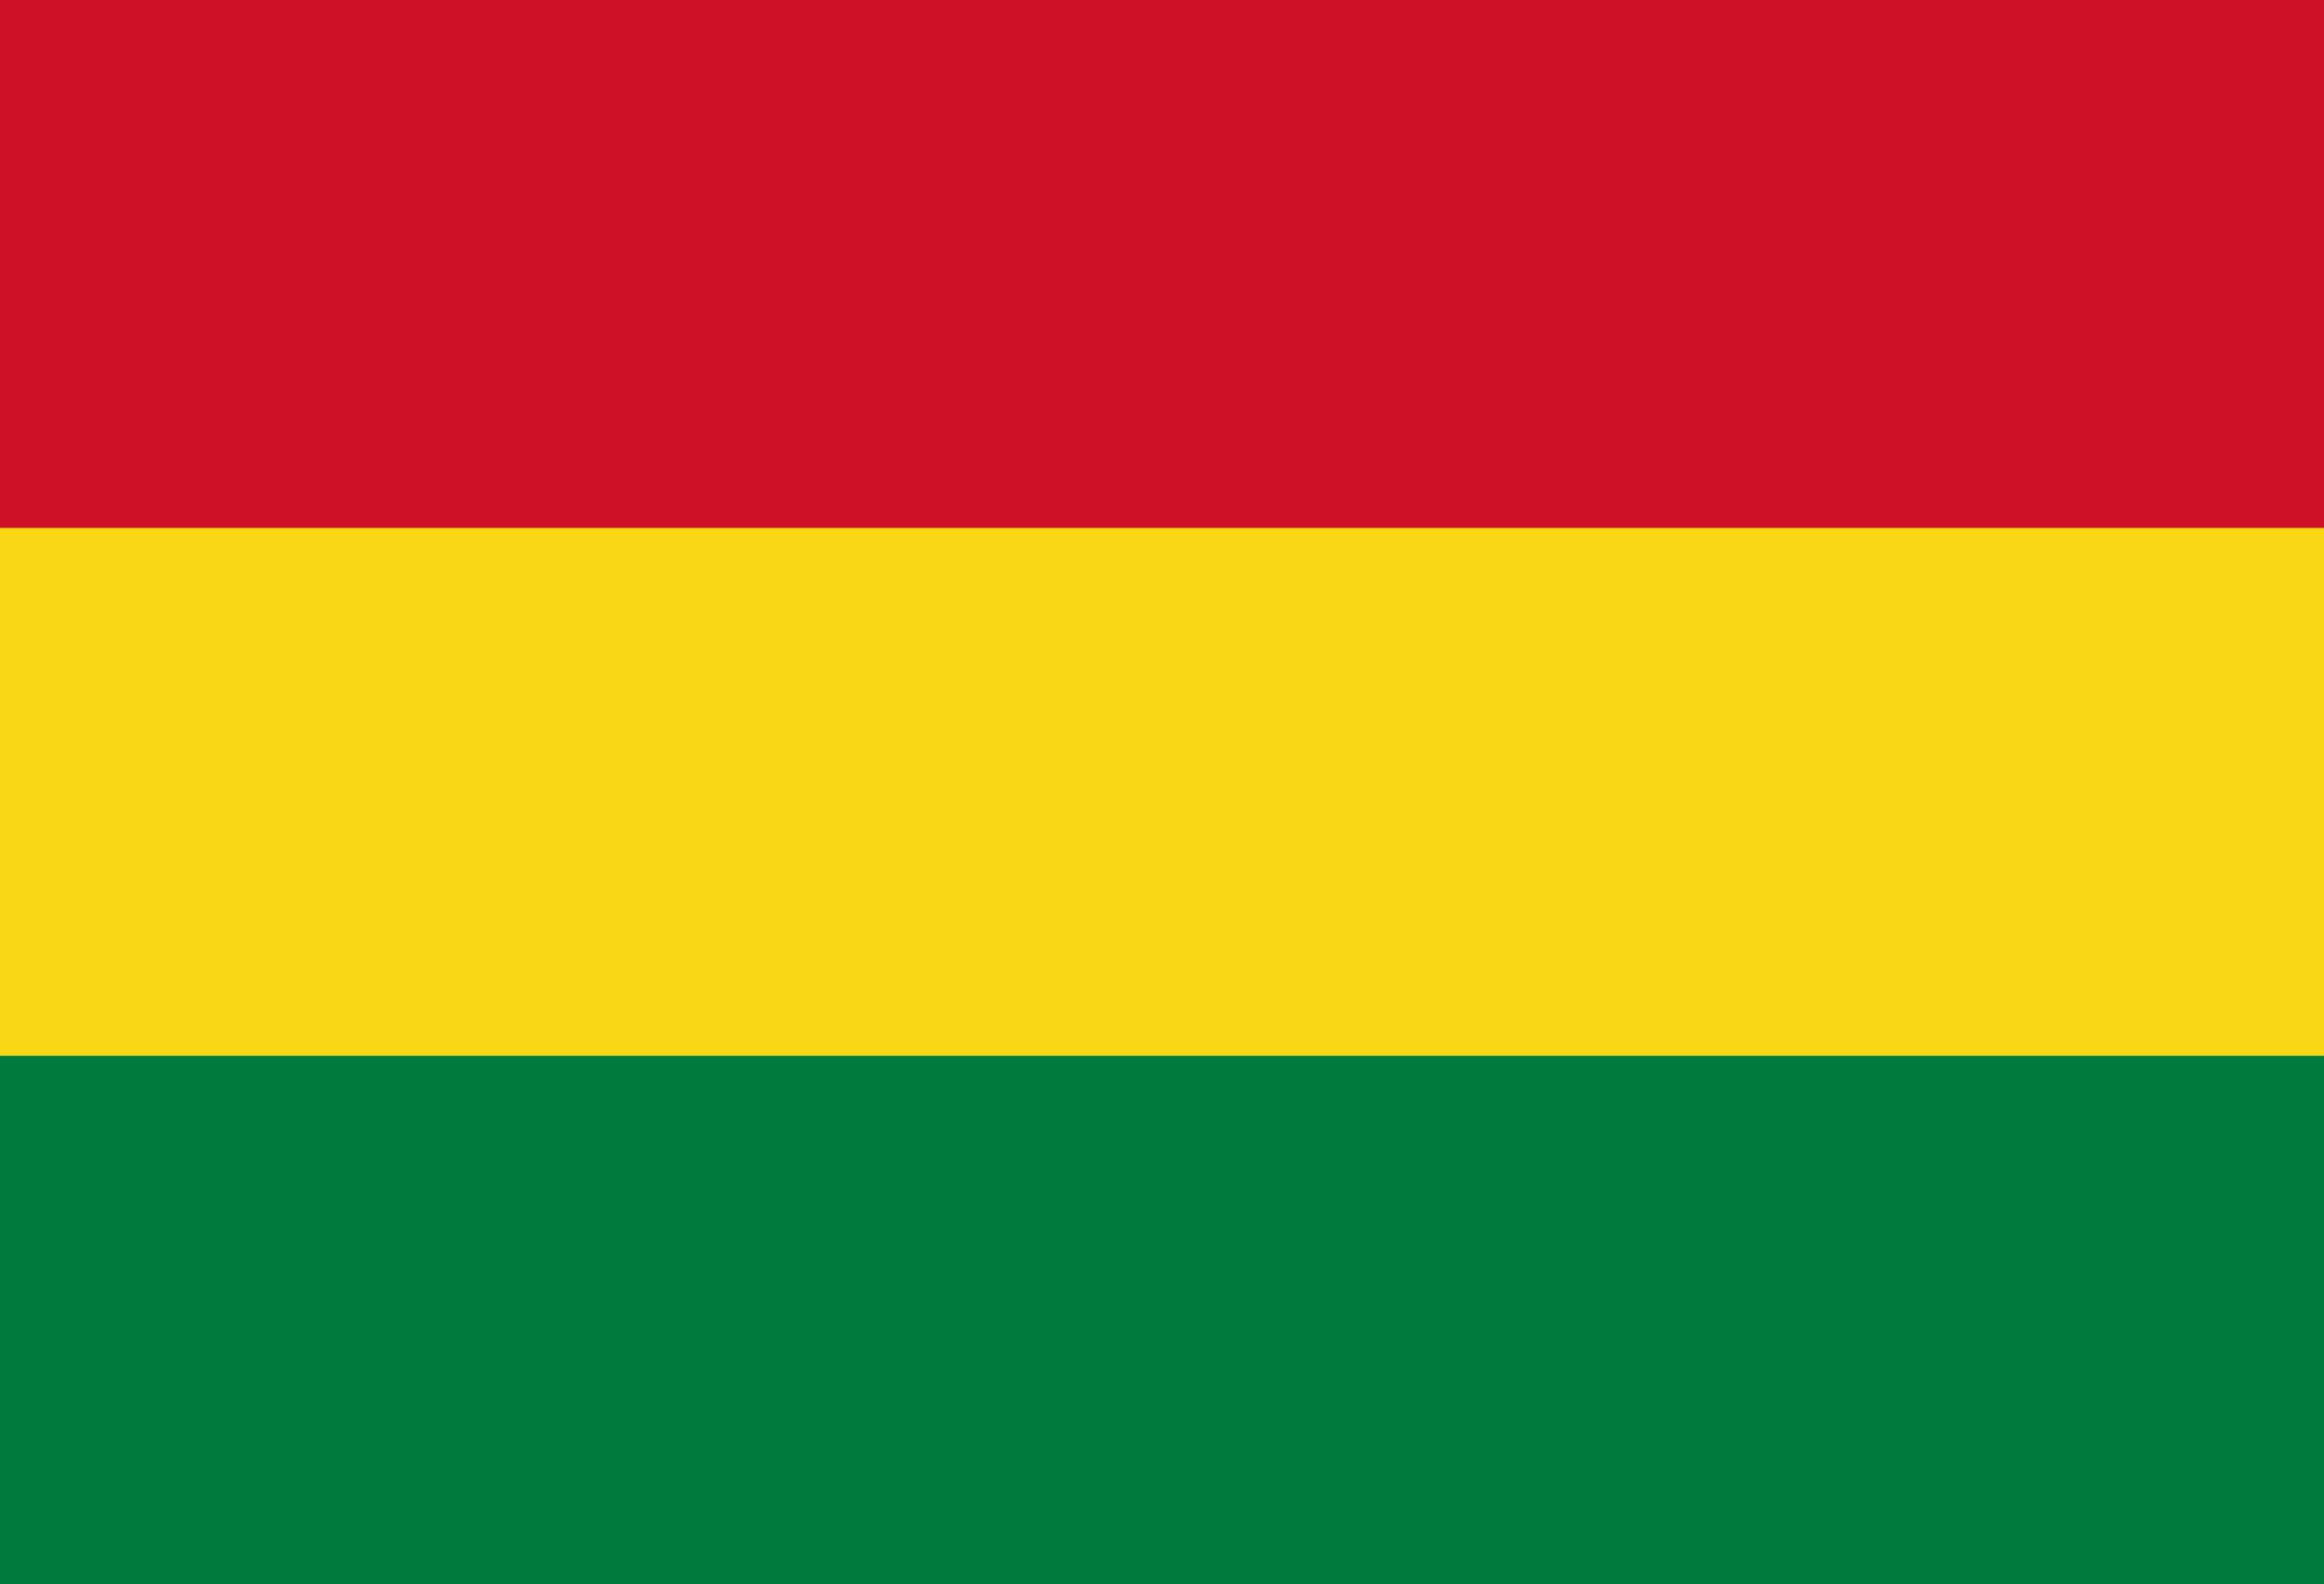 bolivia, paese, emblema, logo, simbolo - Sfondi HD - Professor-falken.com